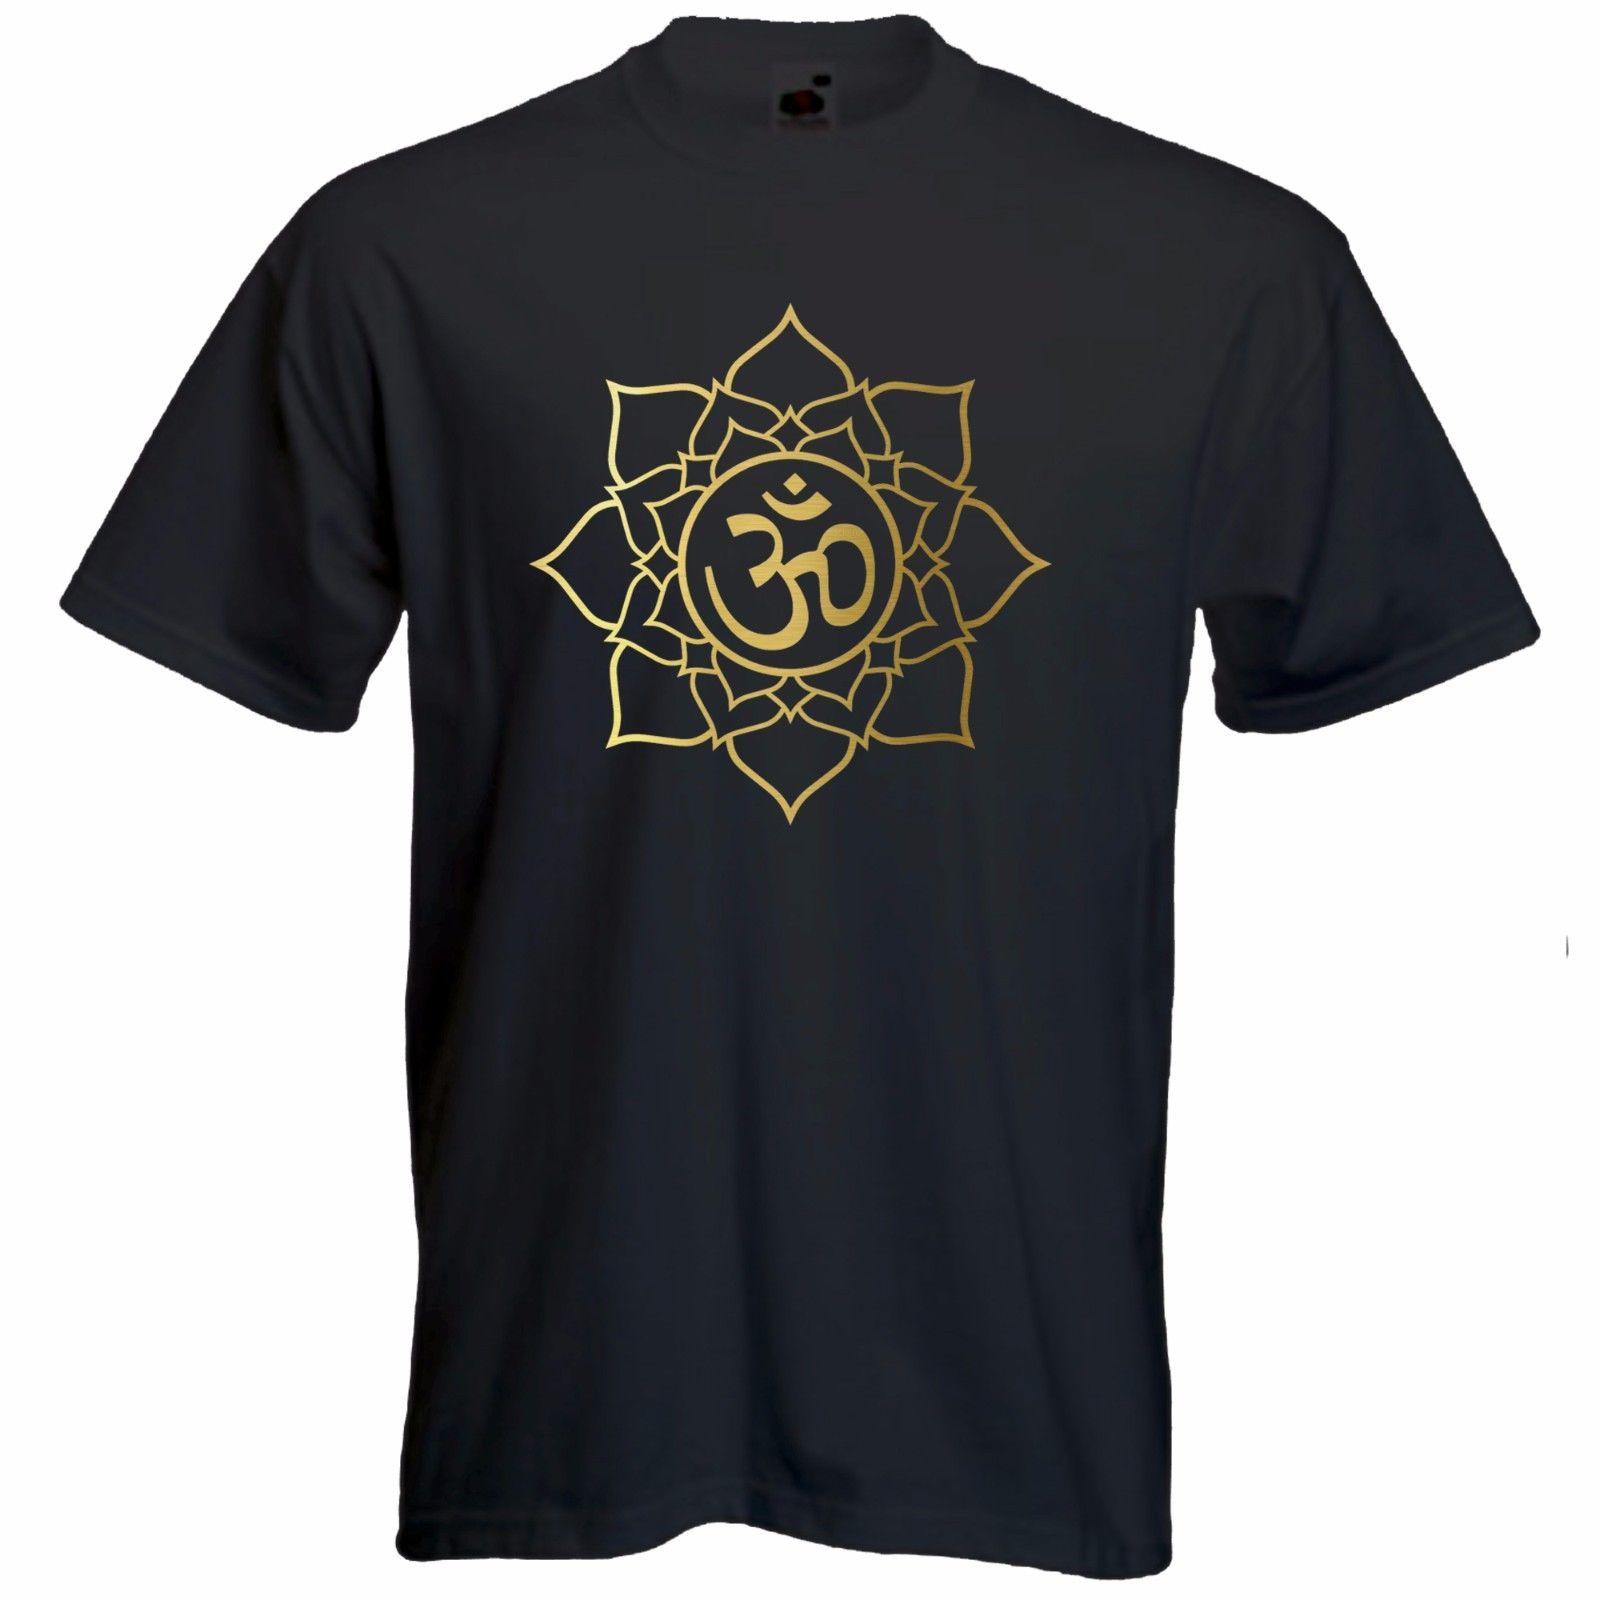 Camiseta Mandala-indie-hindú estilo sagrado geometría t-mens de manga corta Camiseta Cool Casual pride camiseta hombres Unisex moda camiseta